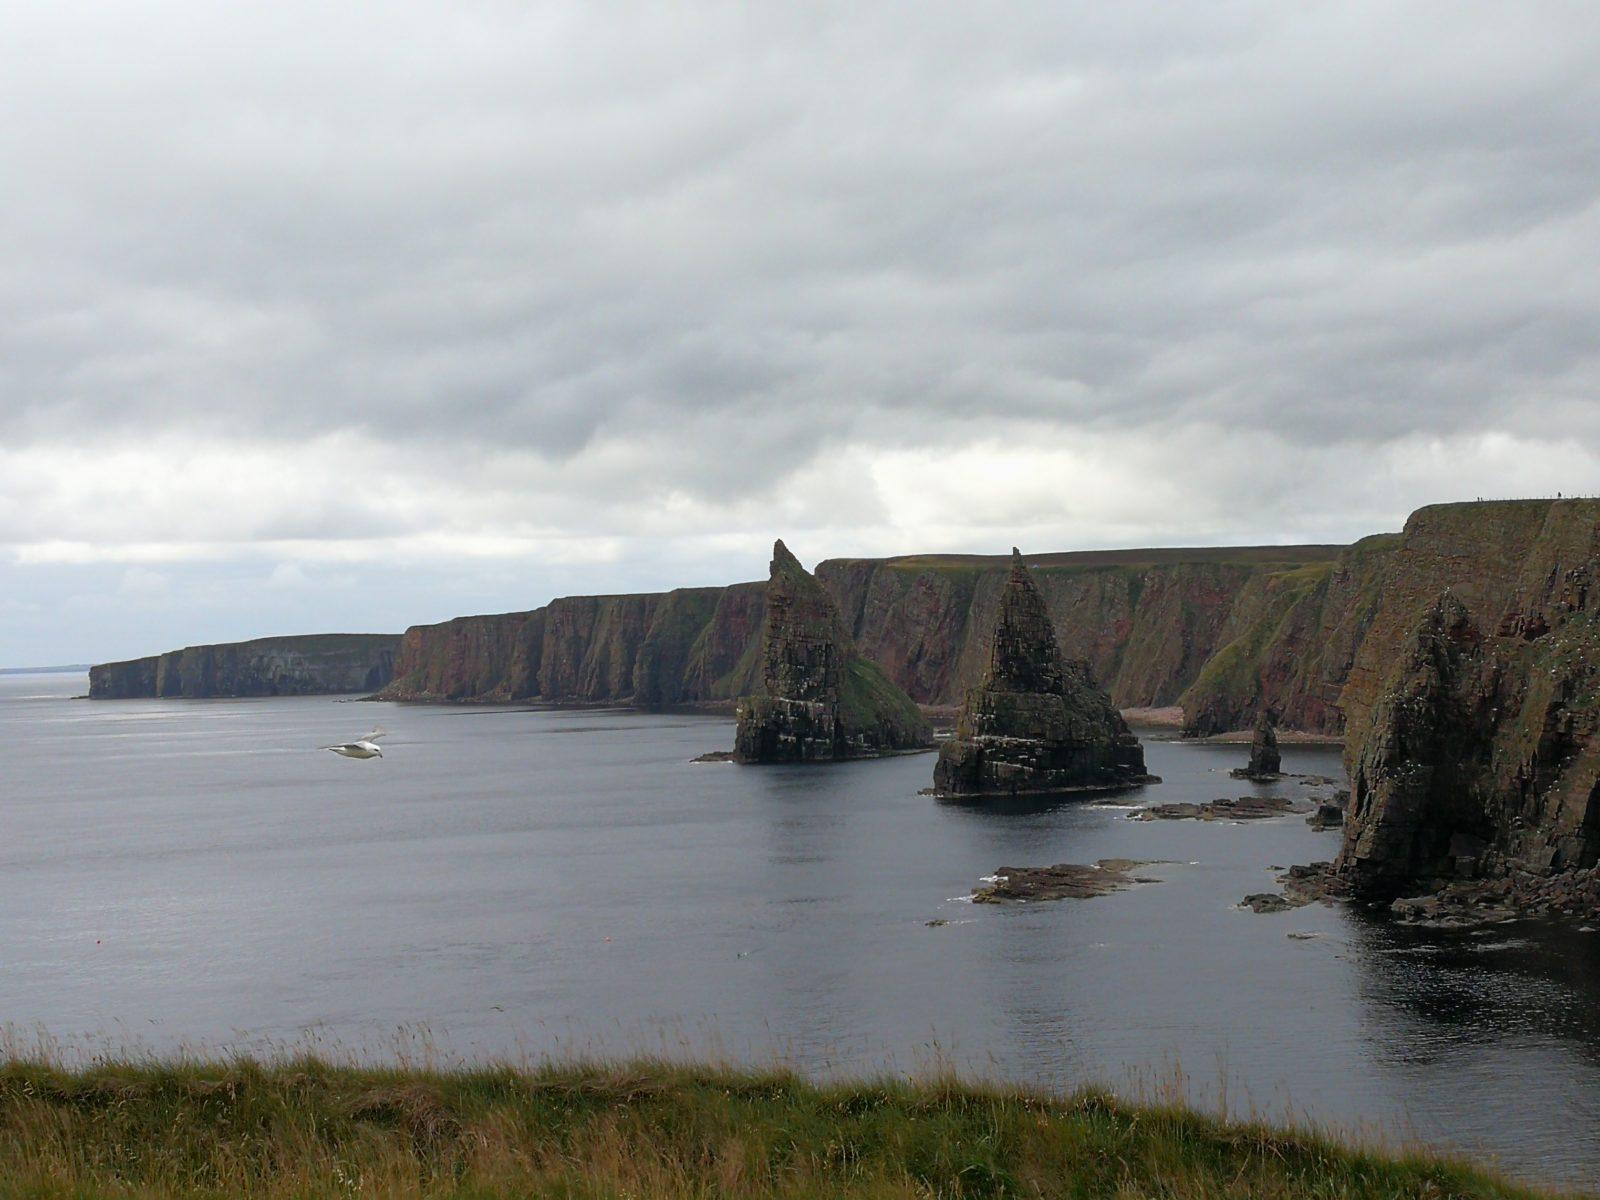 Falaises du Pentland Firth, Ecosse